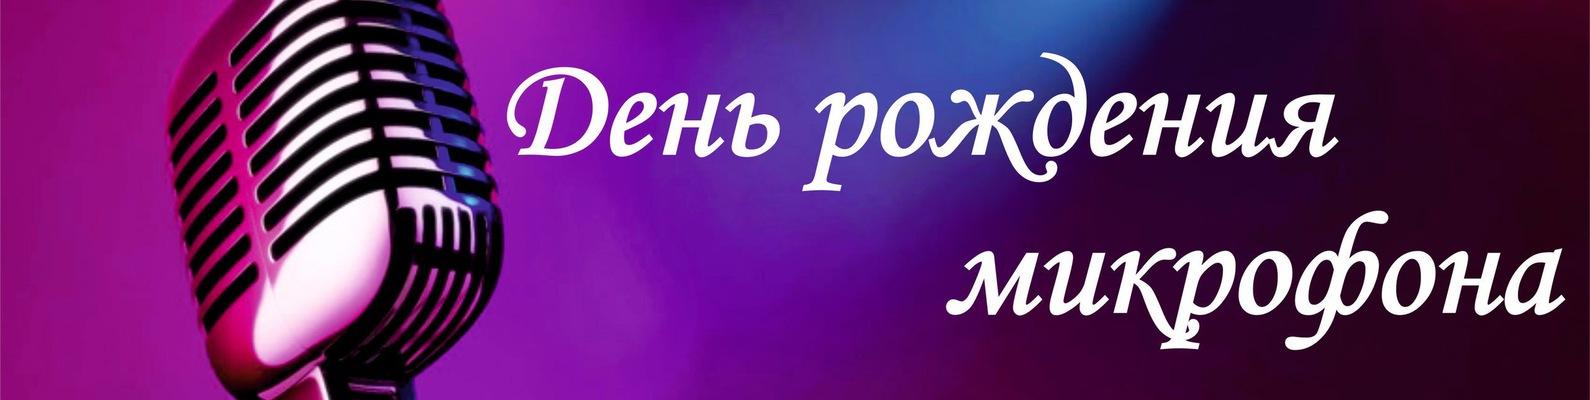 iwNkXO7PDJQ.jpg